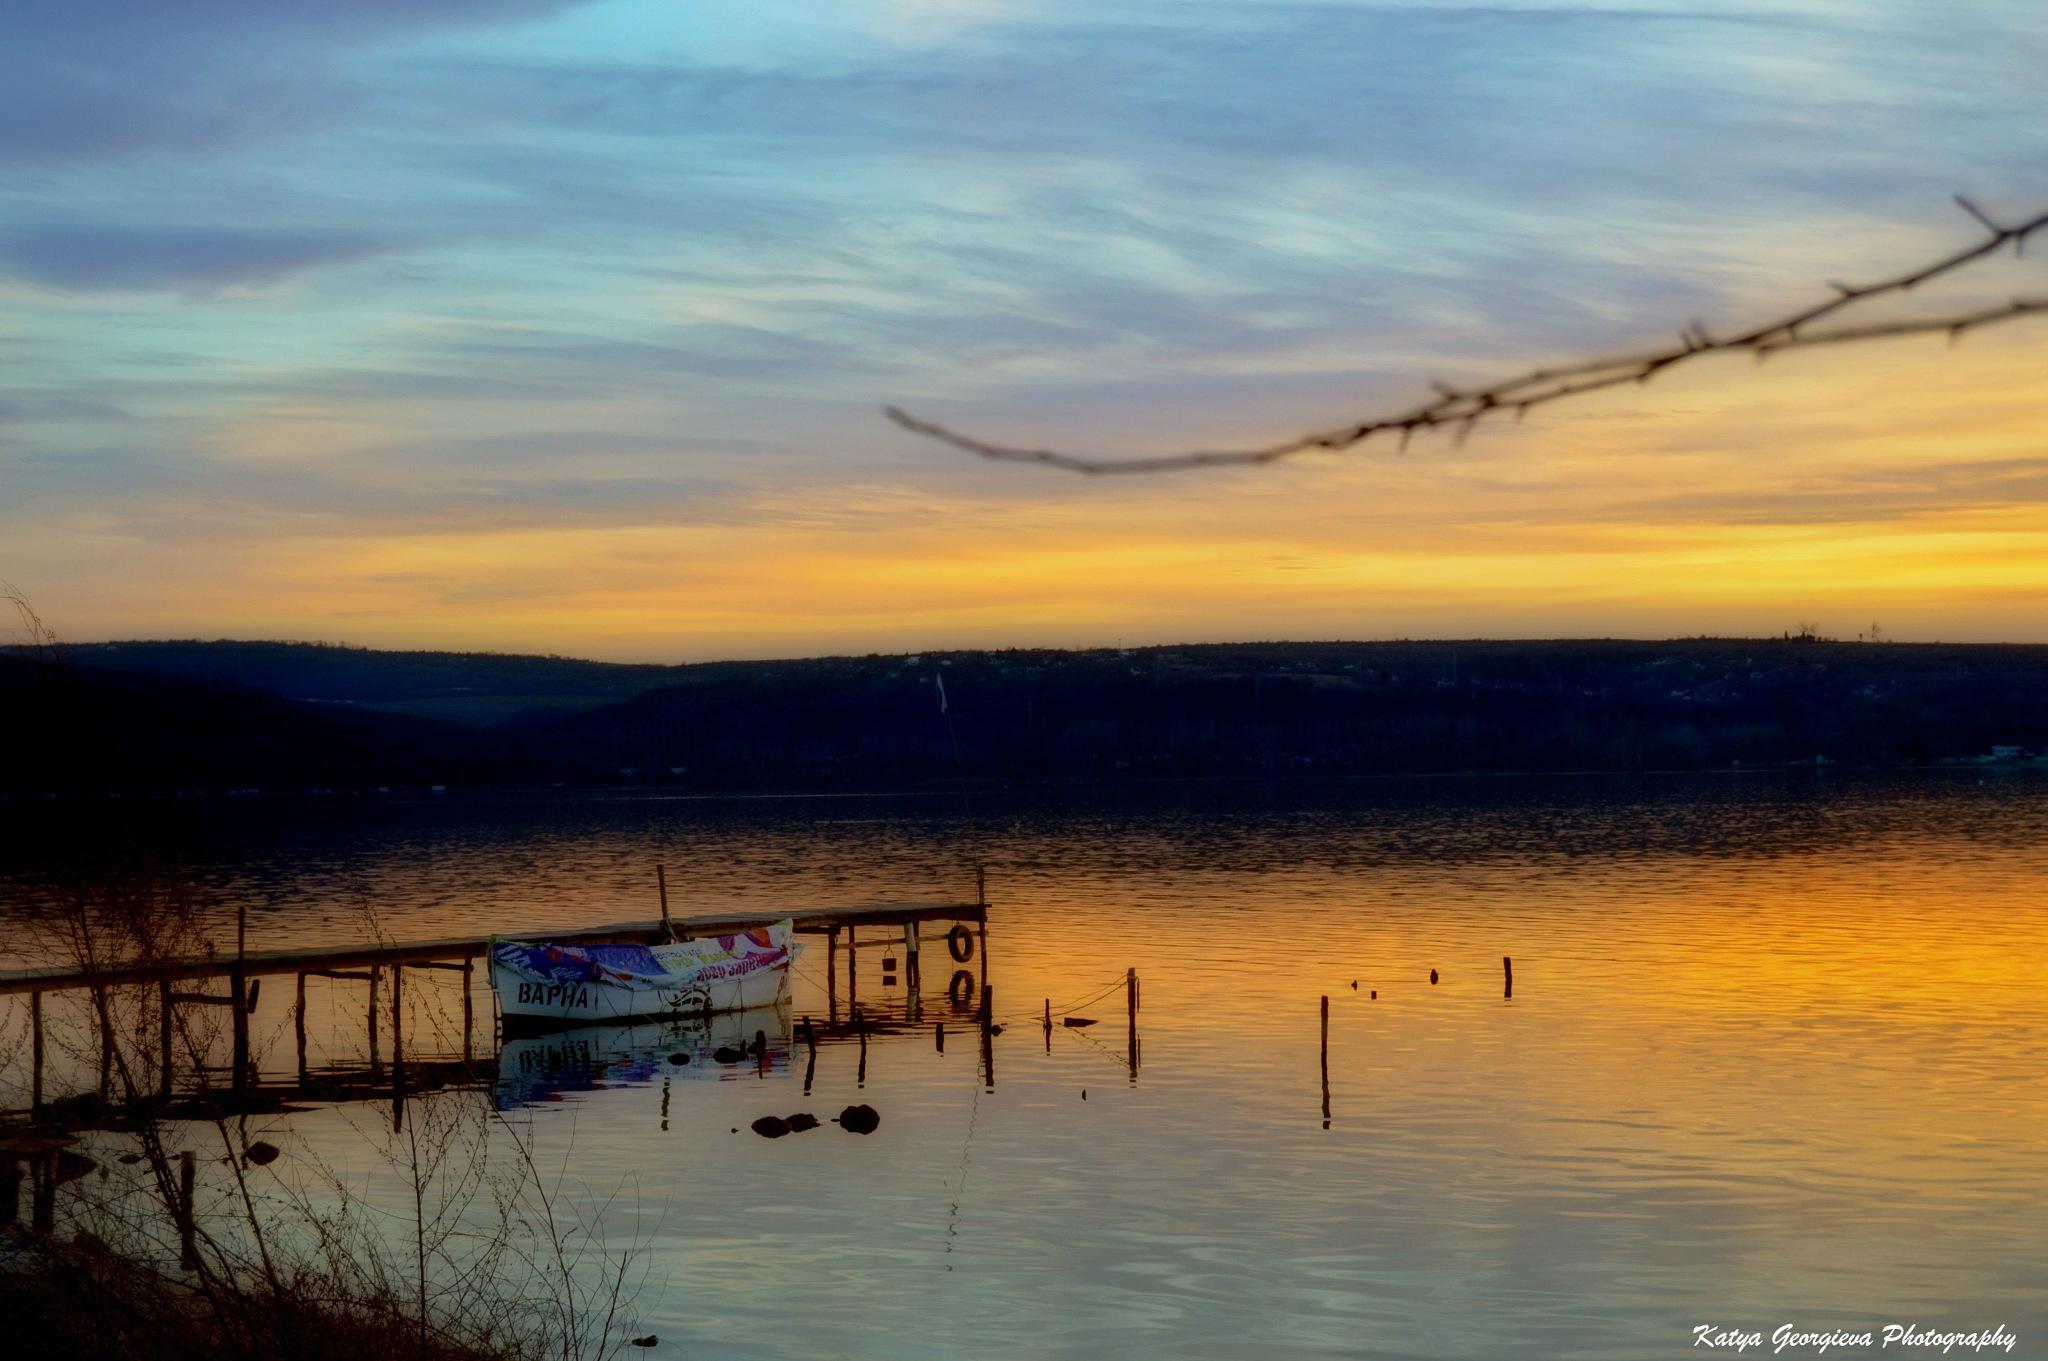 The sun slowly disappears over the lake.... by Katya Georgieva Photography